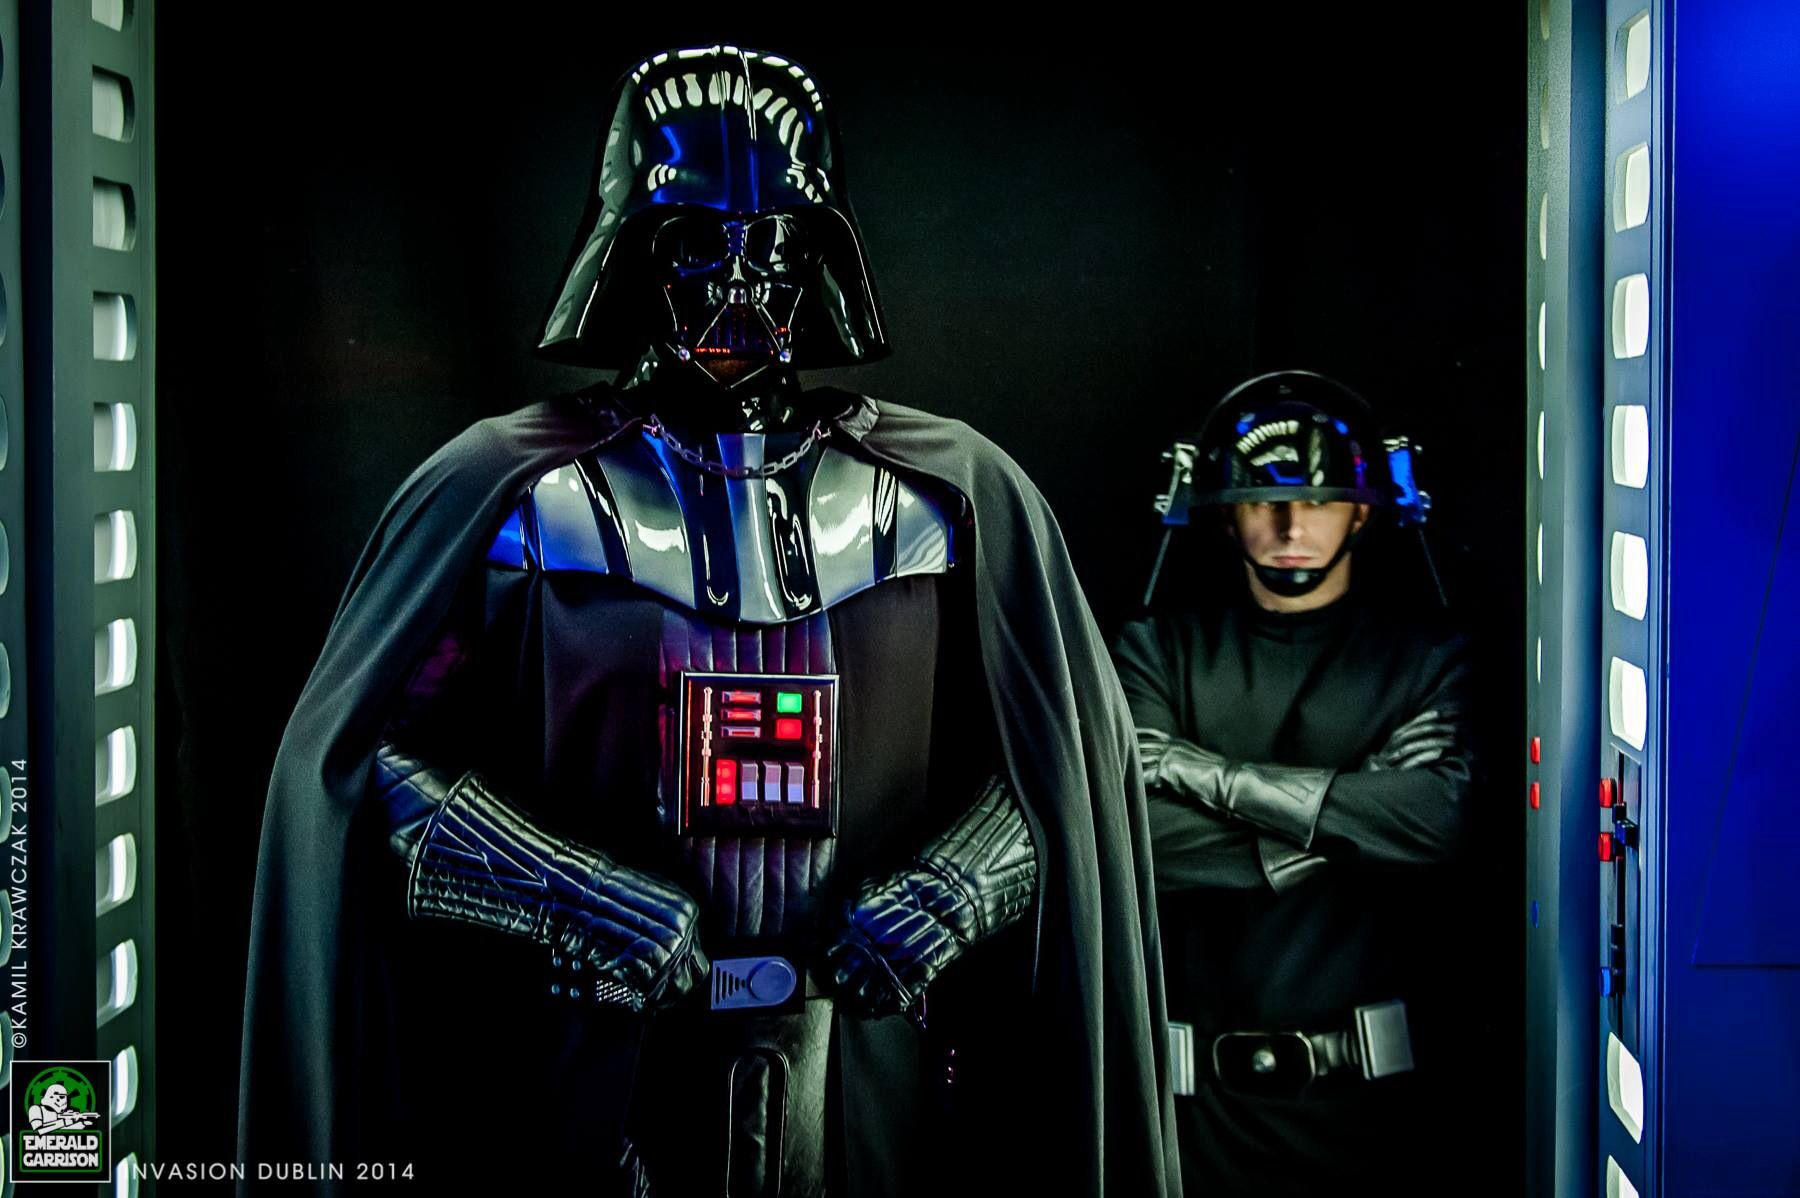 Revenge Of The Sith Darth Vader Costume Worn By Julian Checkley Darth Vader Costumes Darth Vader Darth